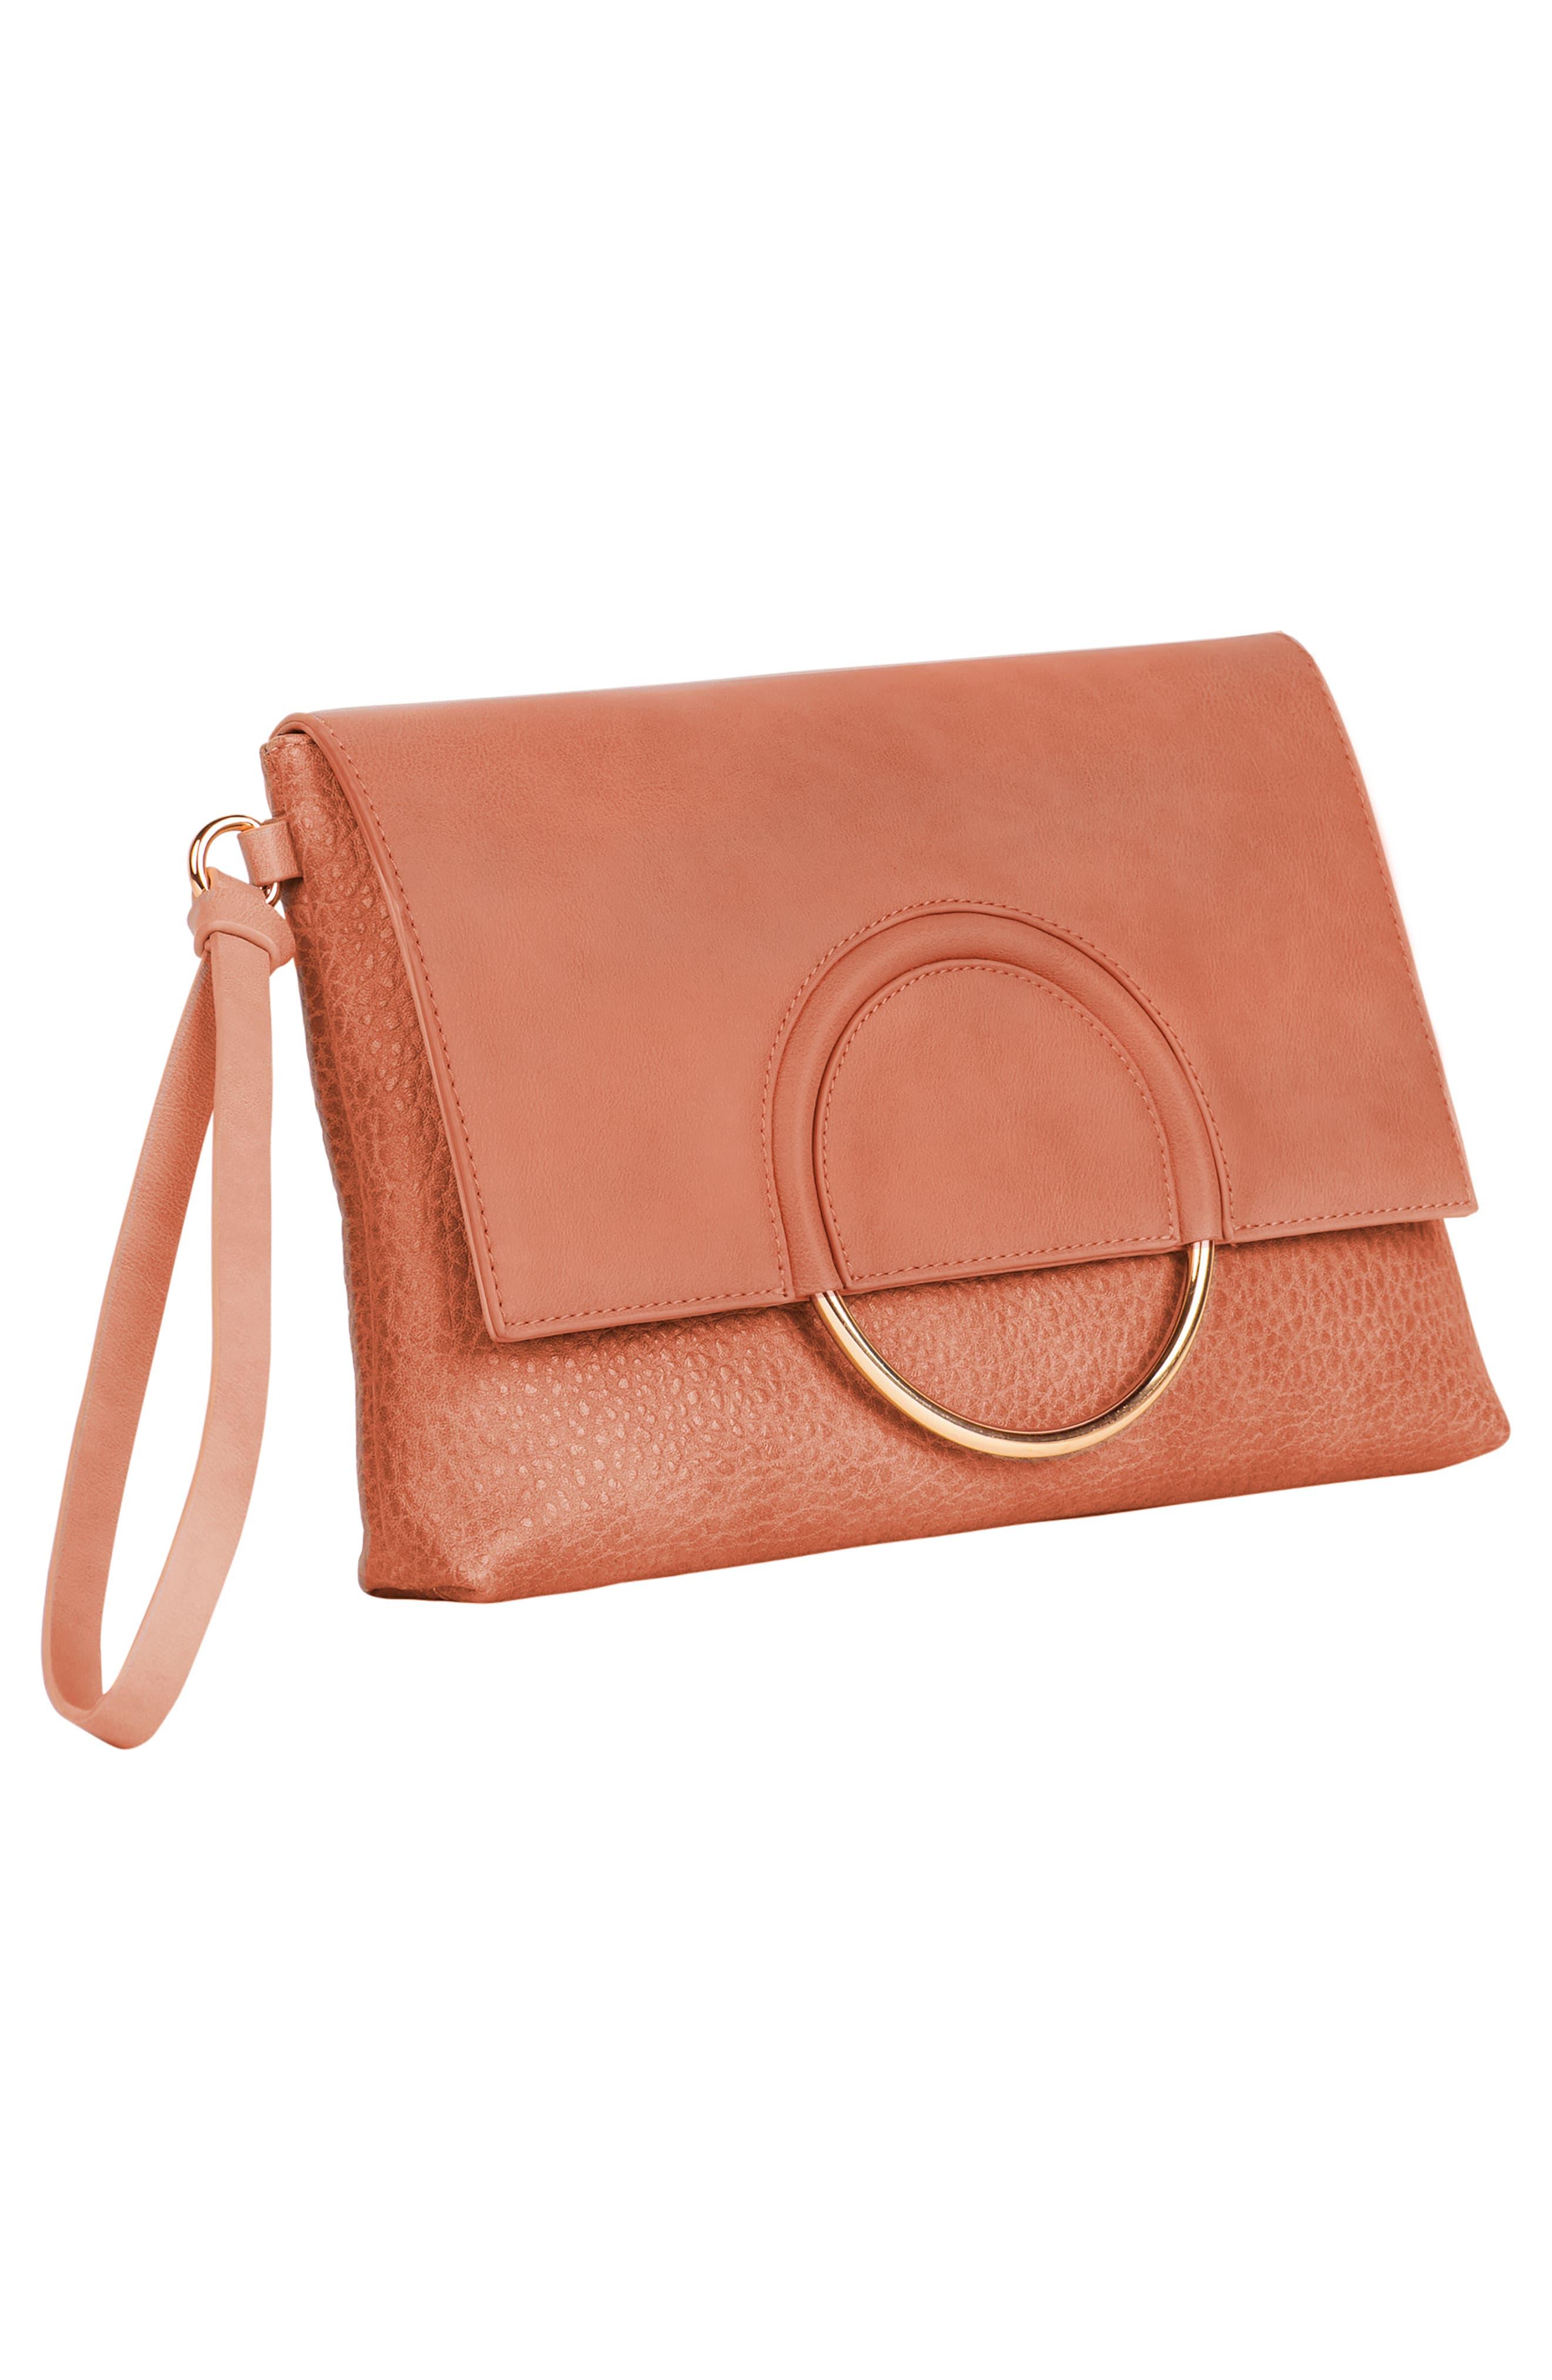 Custom Vegan Leather Wristlet Clutch,                             Alternate thumbnail 3, color,                             ROSE PINK